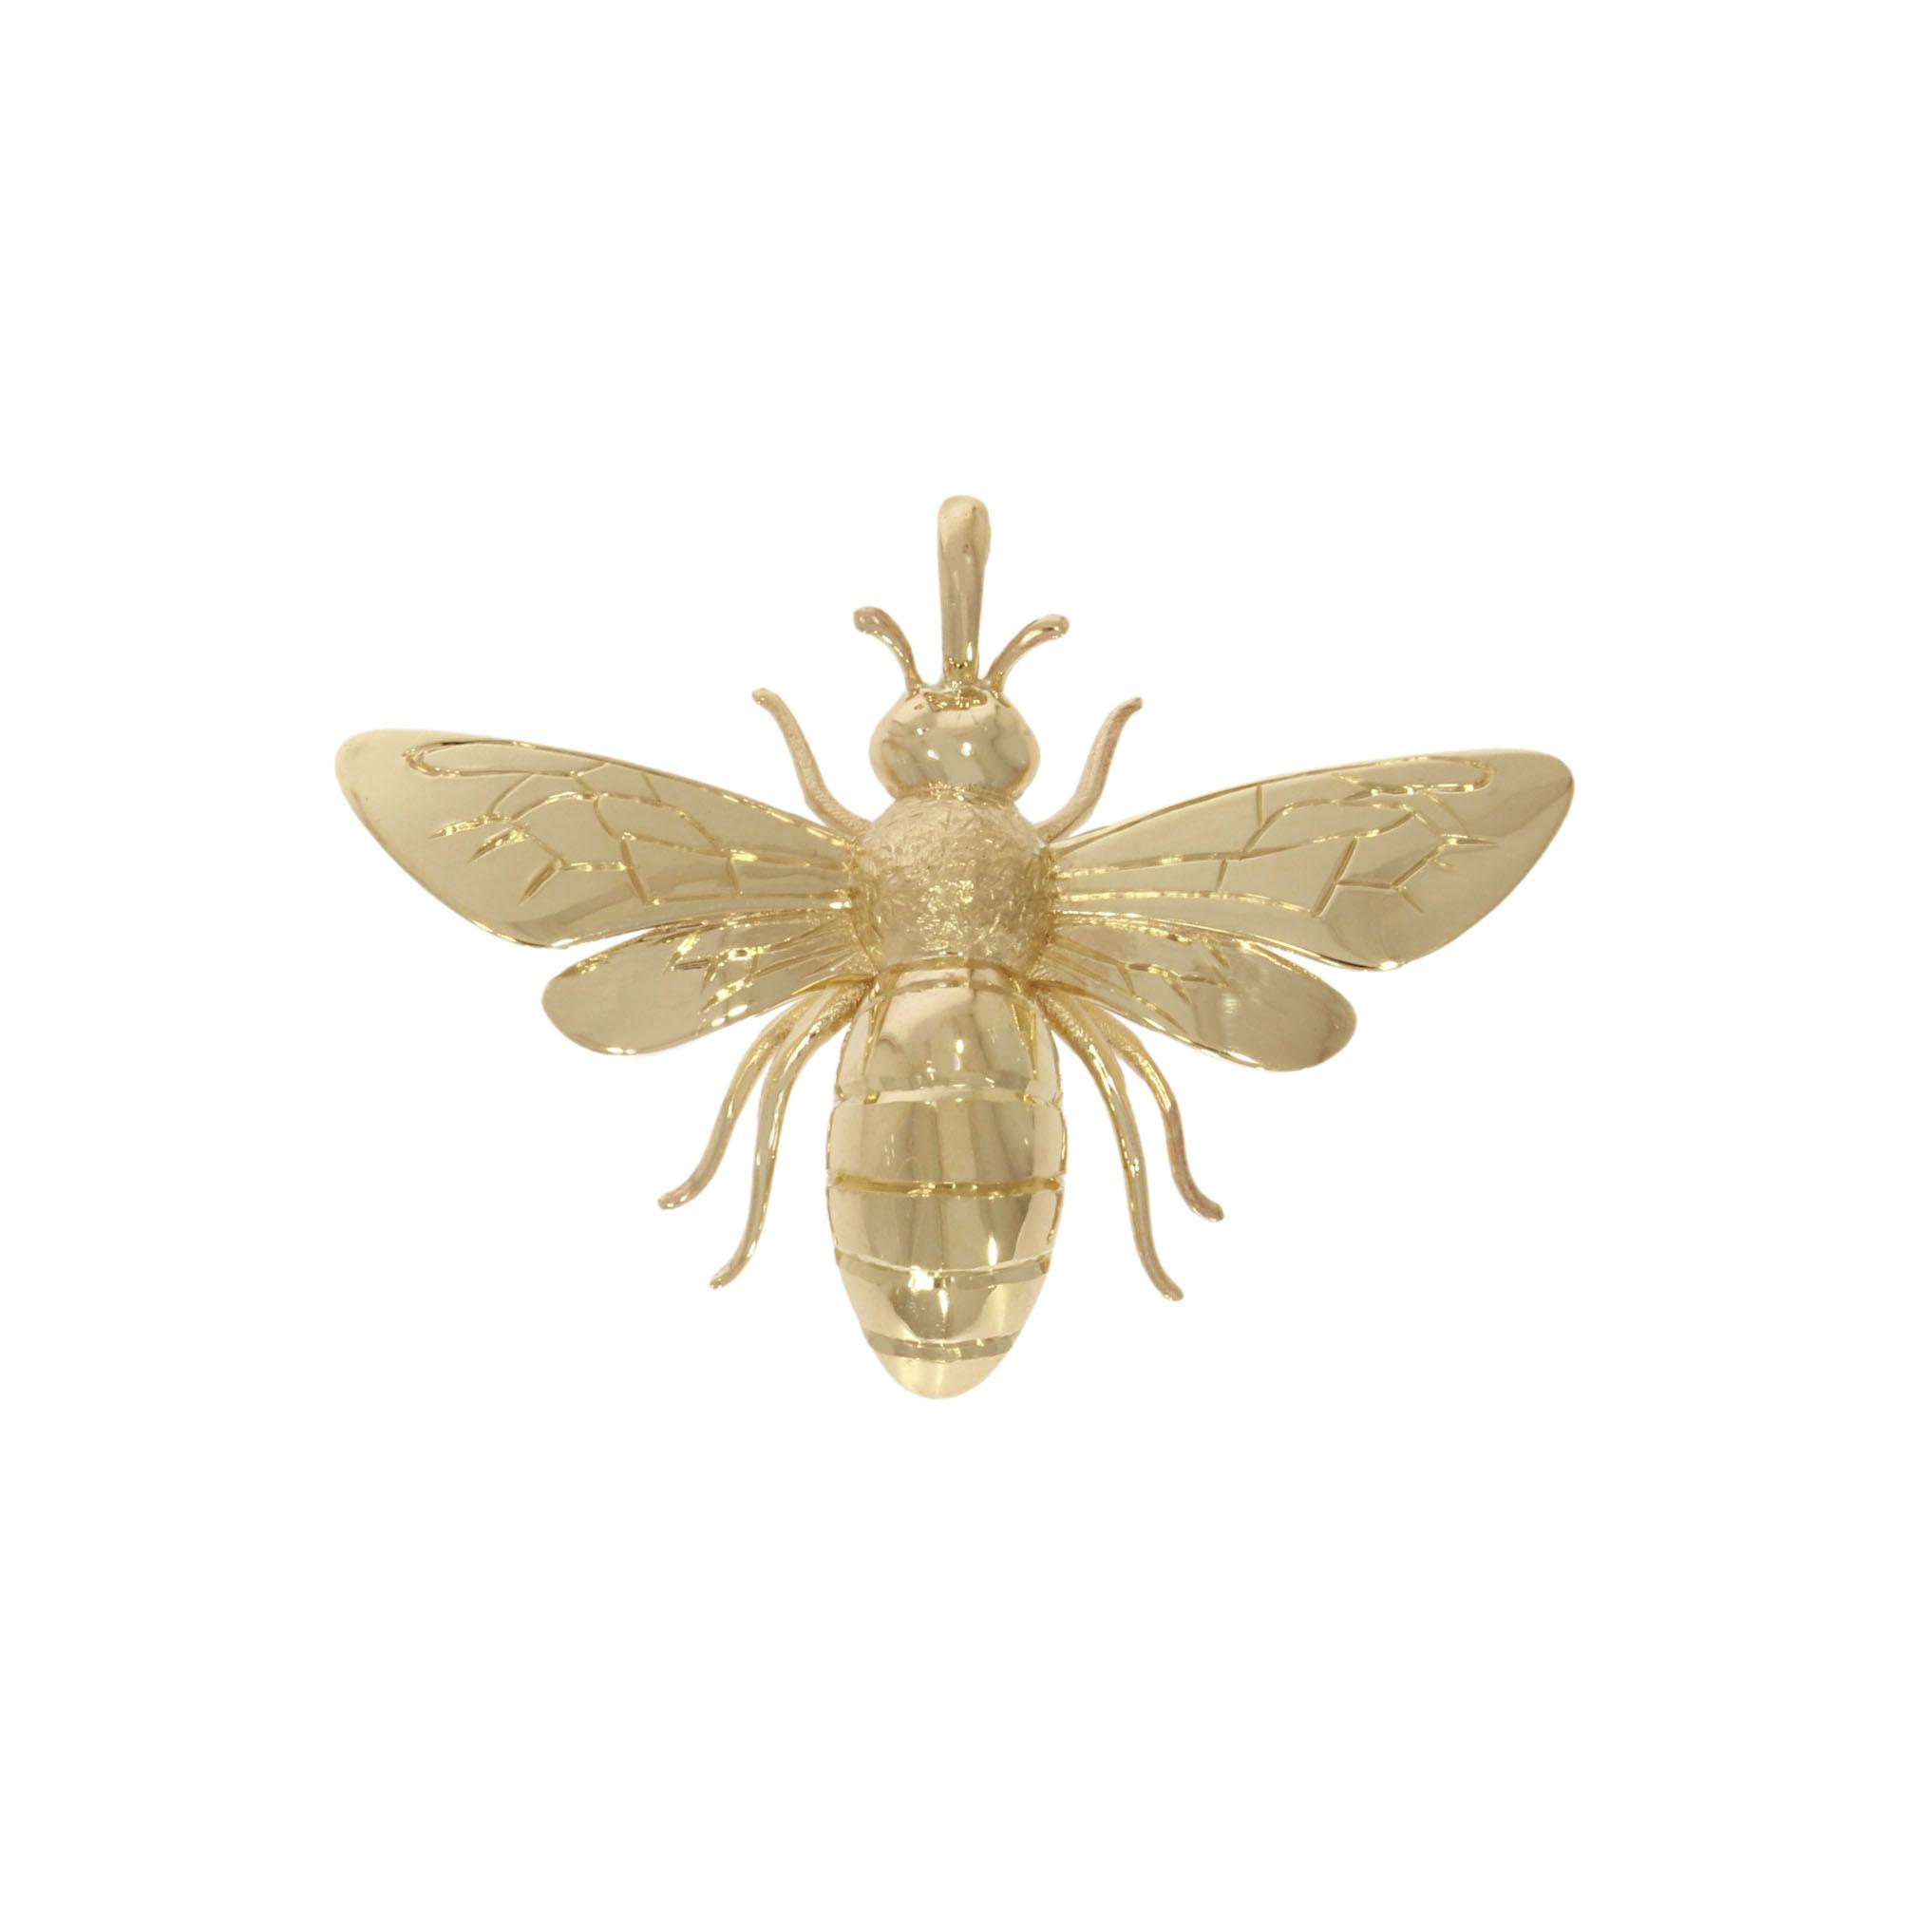 A golden wedding anniversary present for a bee keeper